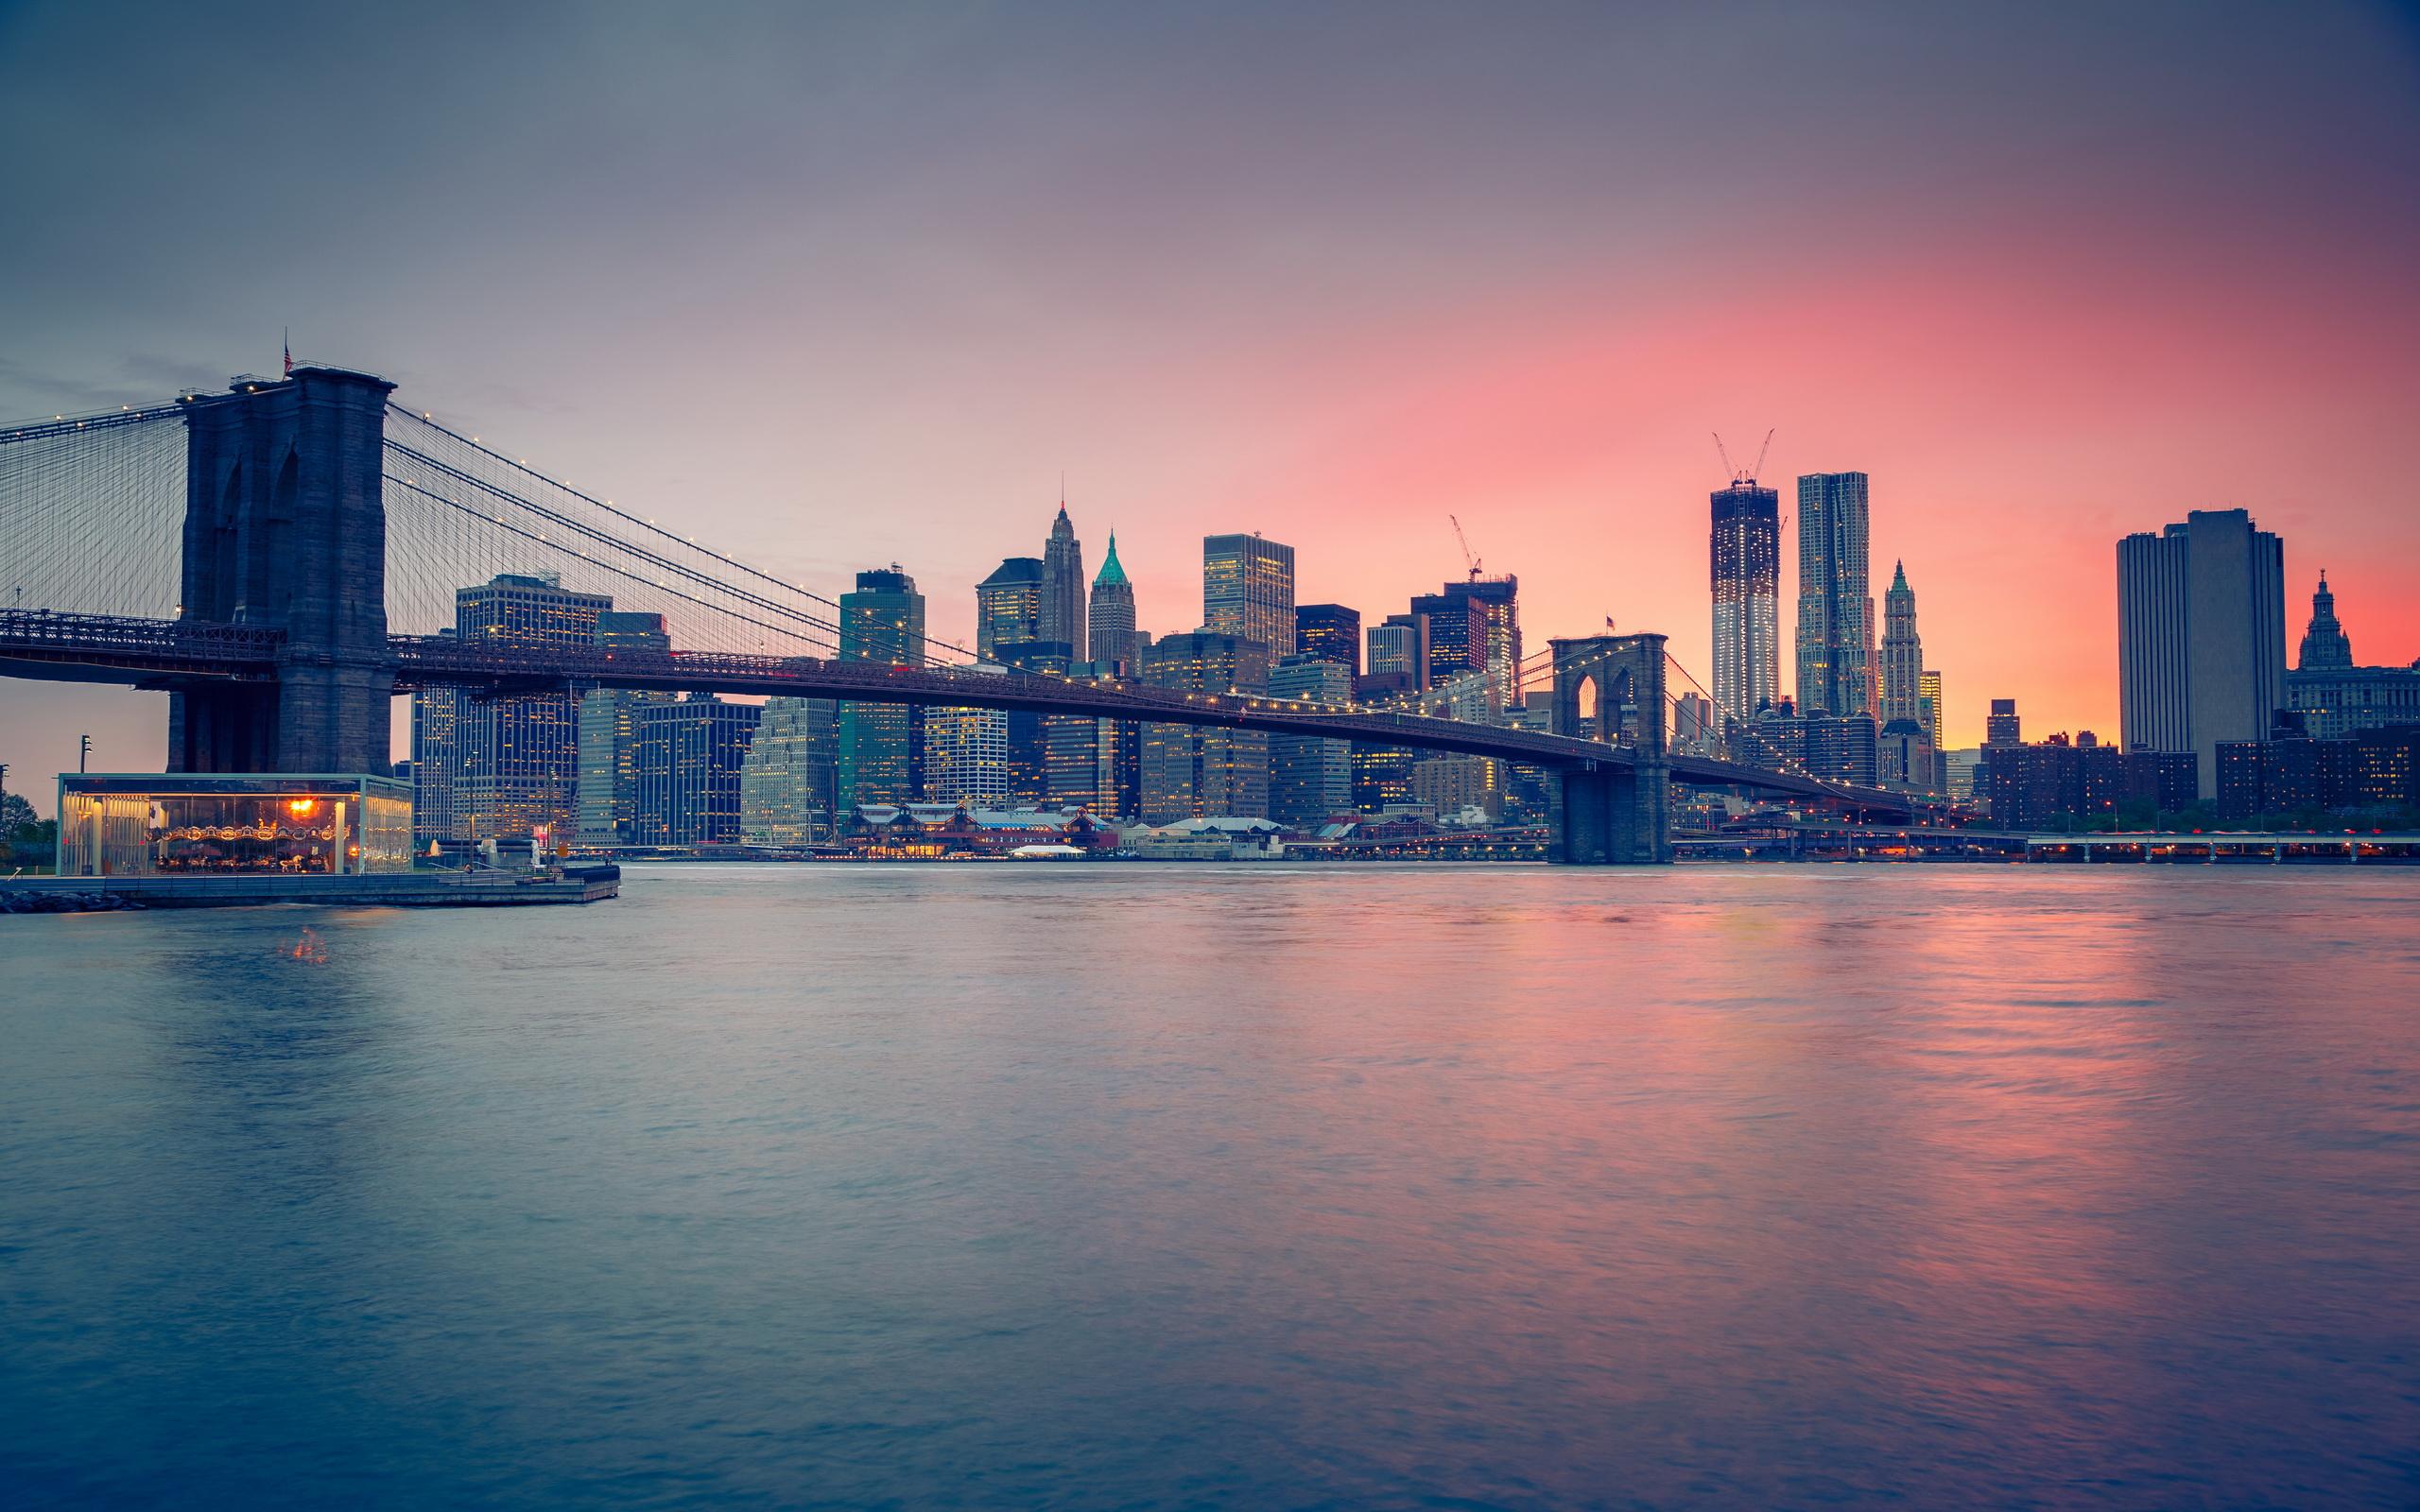 Brooklyn Bridge Hd Wallpaper Background Image 2560x1600